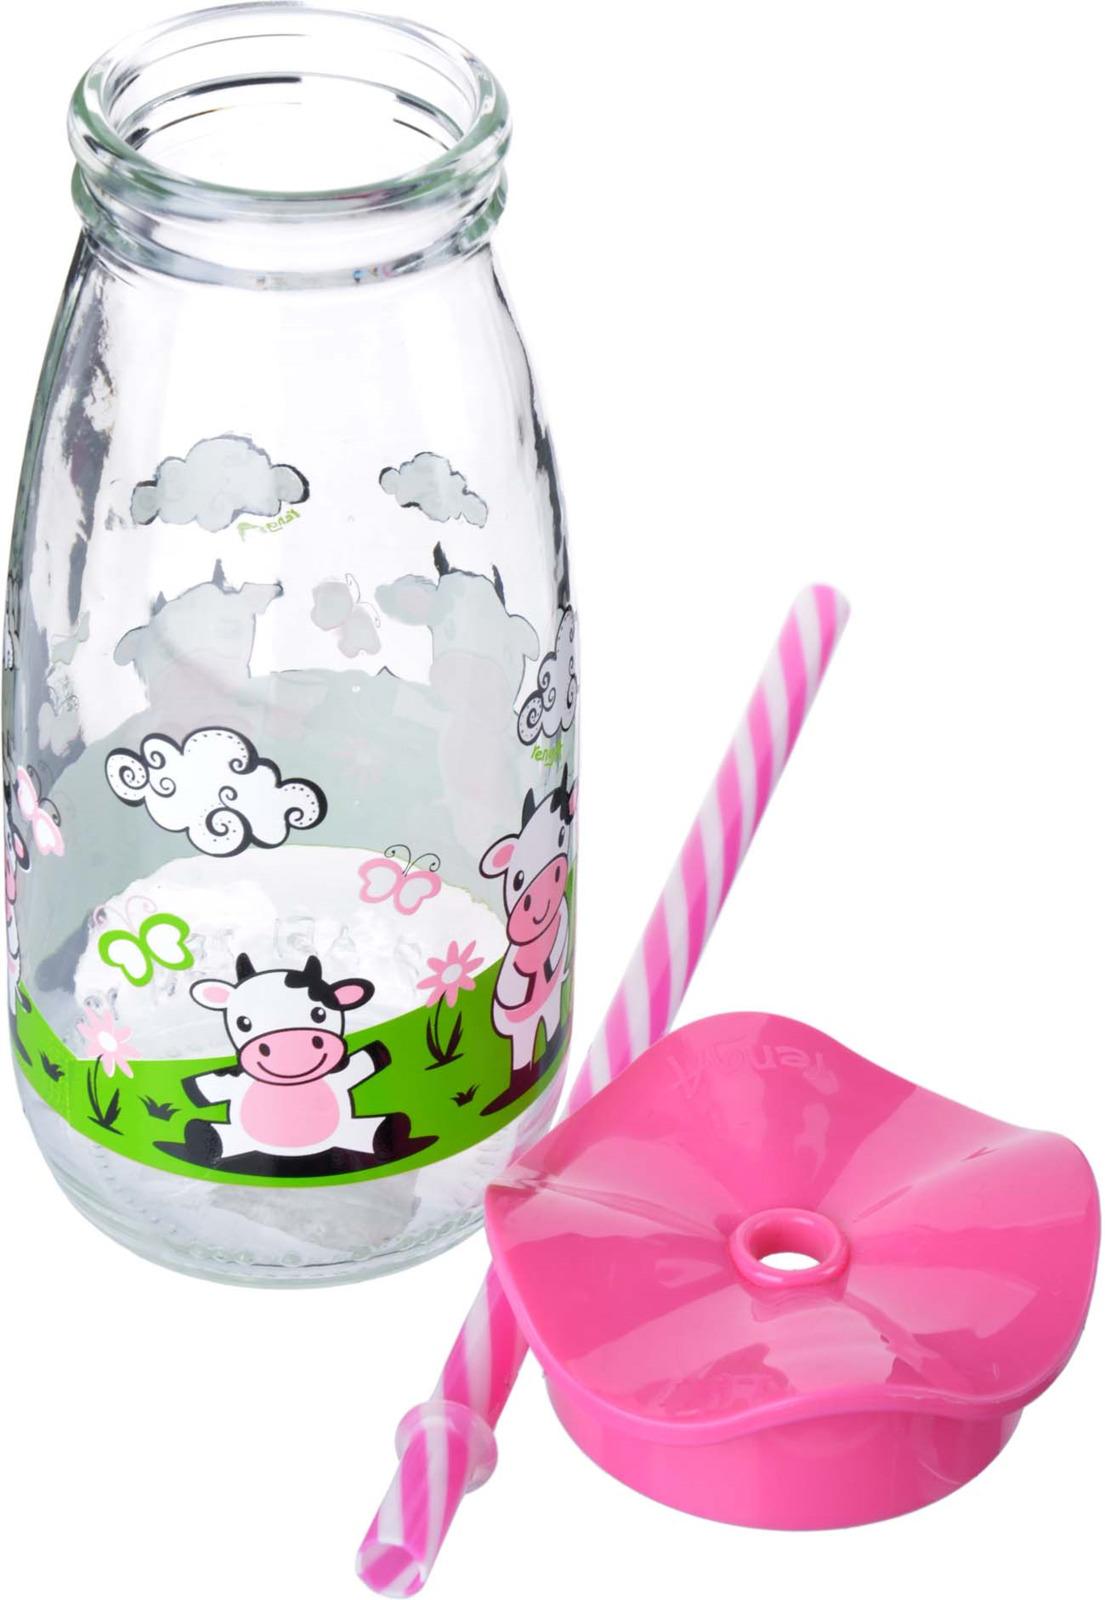 Бутылка для смузи Mayer & Boch, цвет: розовый, 500 мл